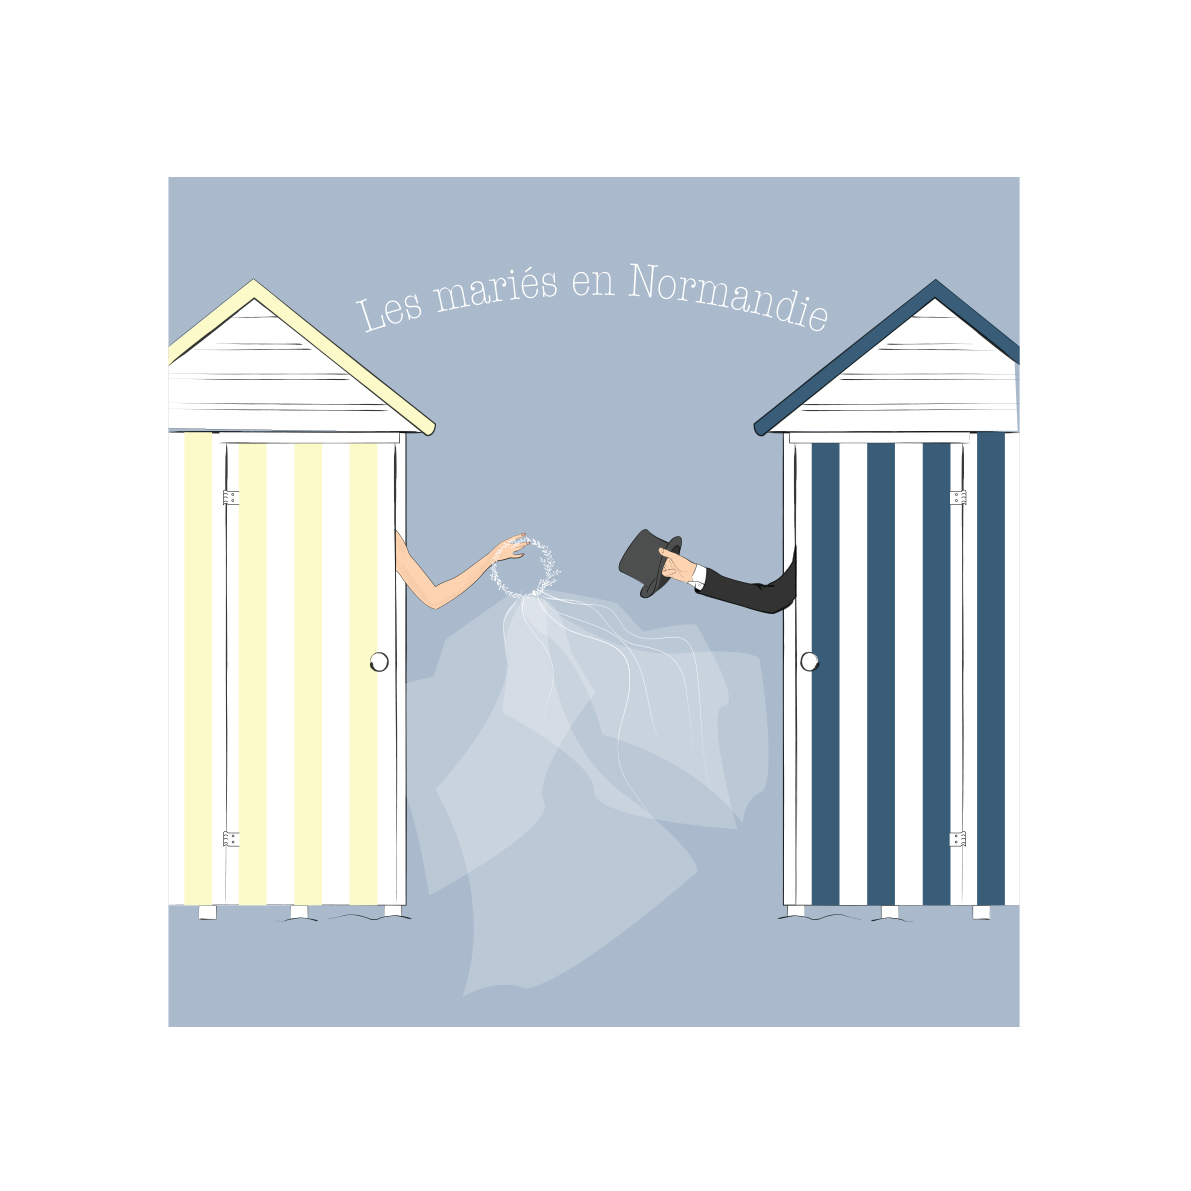 Les mariés de Normandie